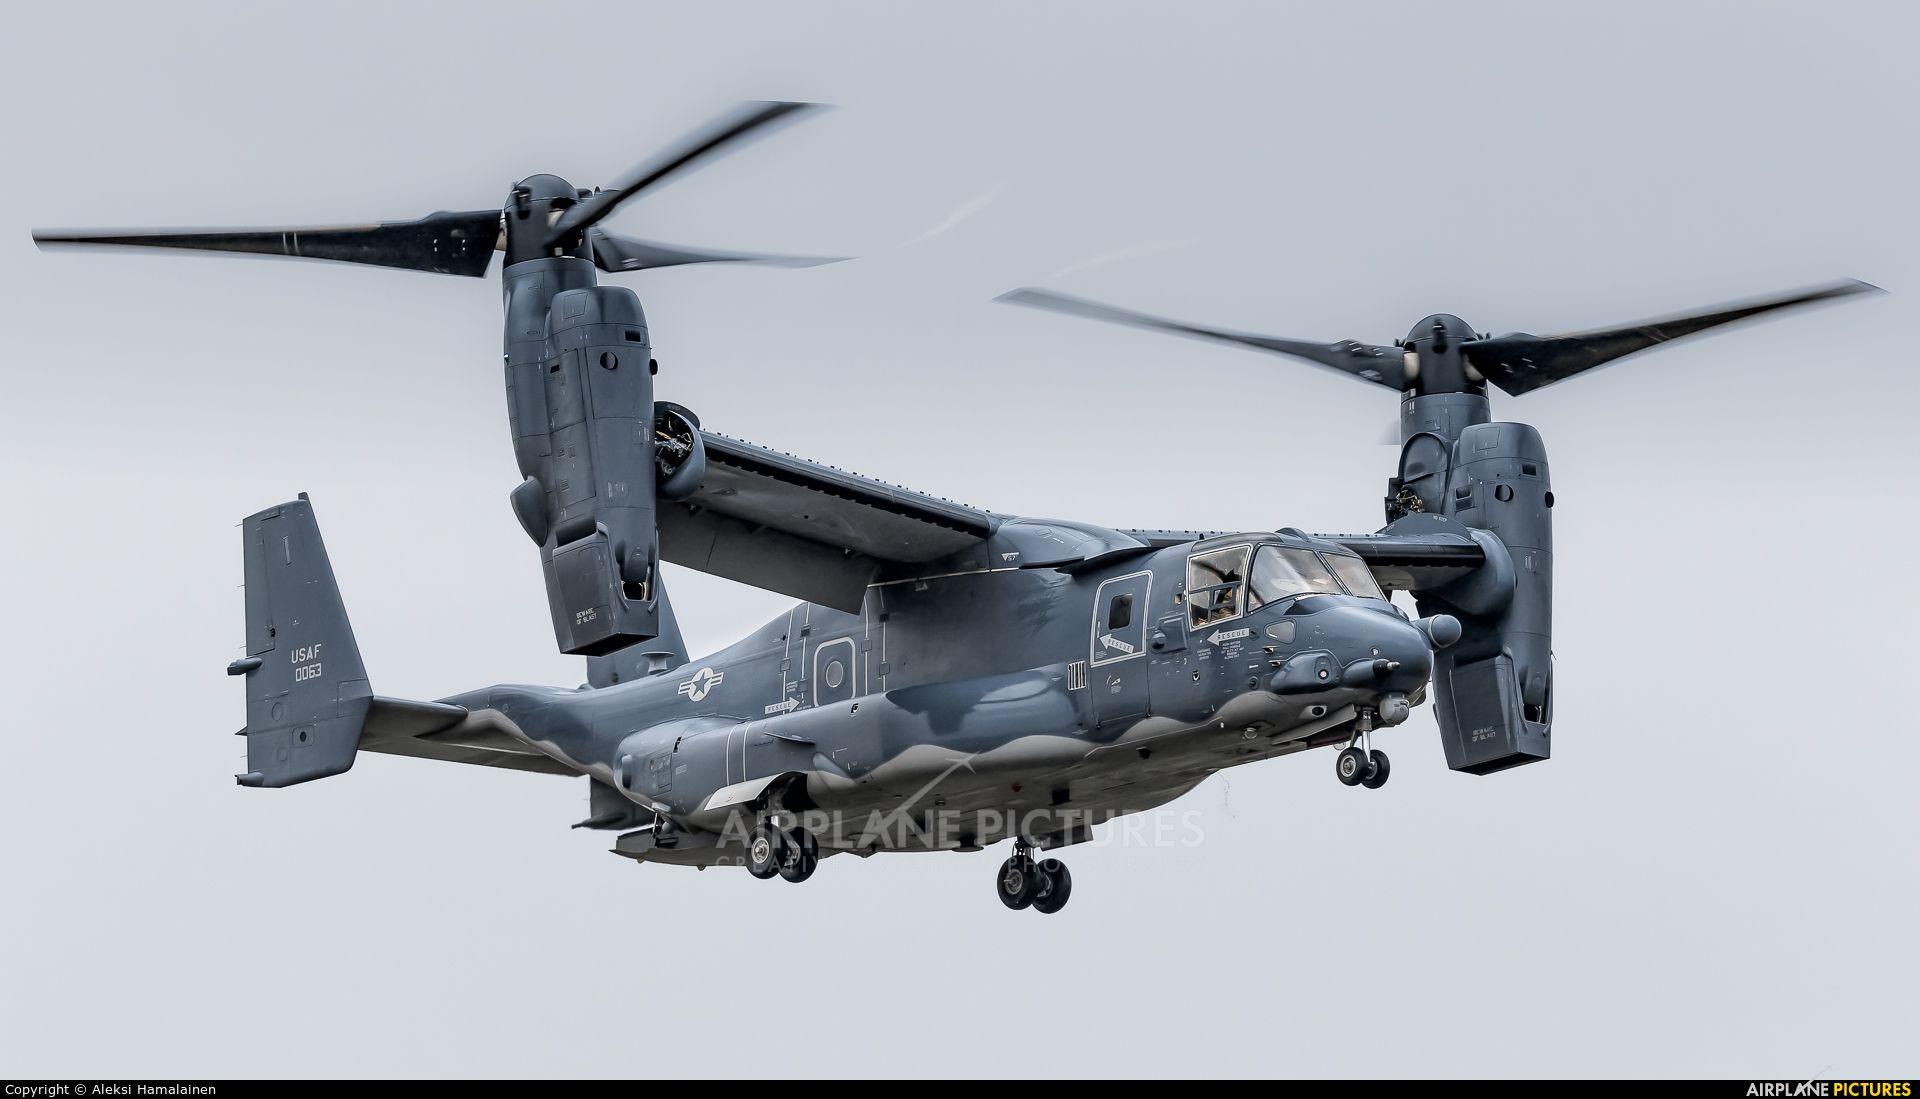 USA Air Force BellBoeing CV22B Osprey photo by Aleksi